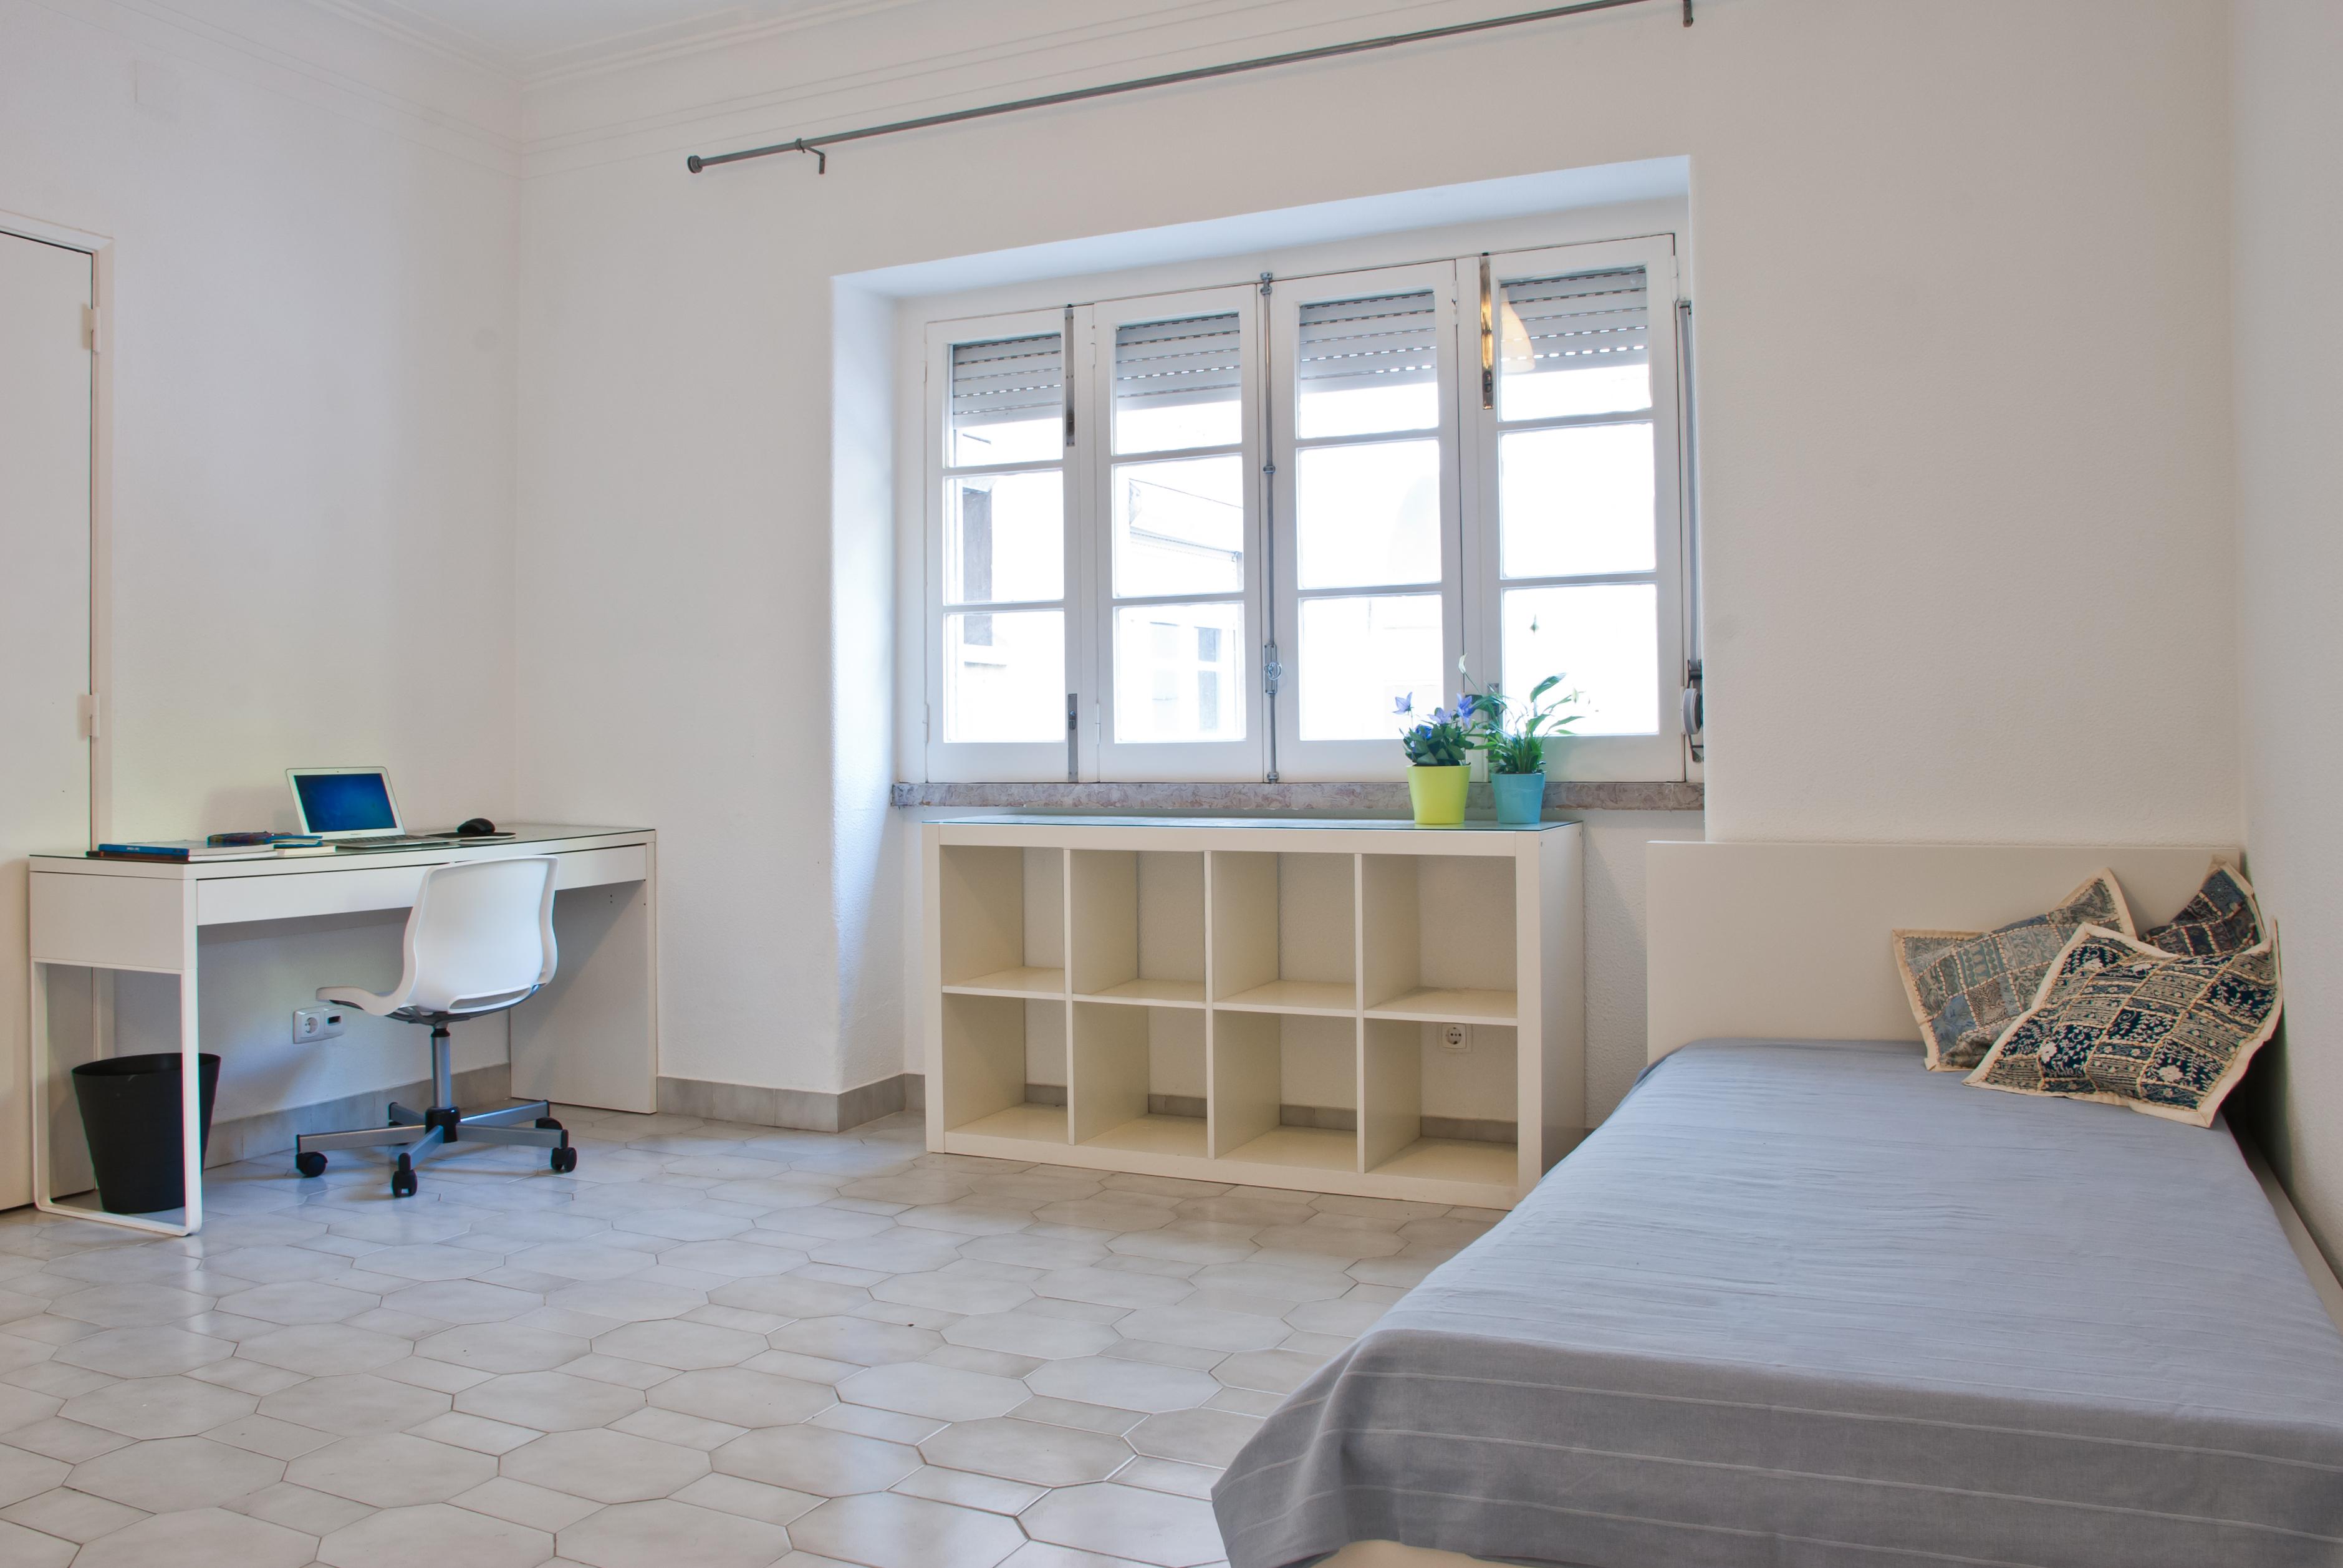 GJ_-_Quarto.Room_nº5_-_Foto_1.jpg